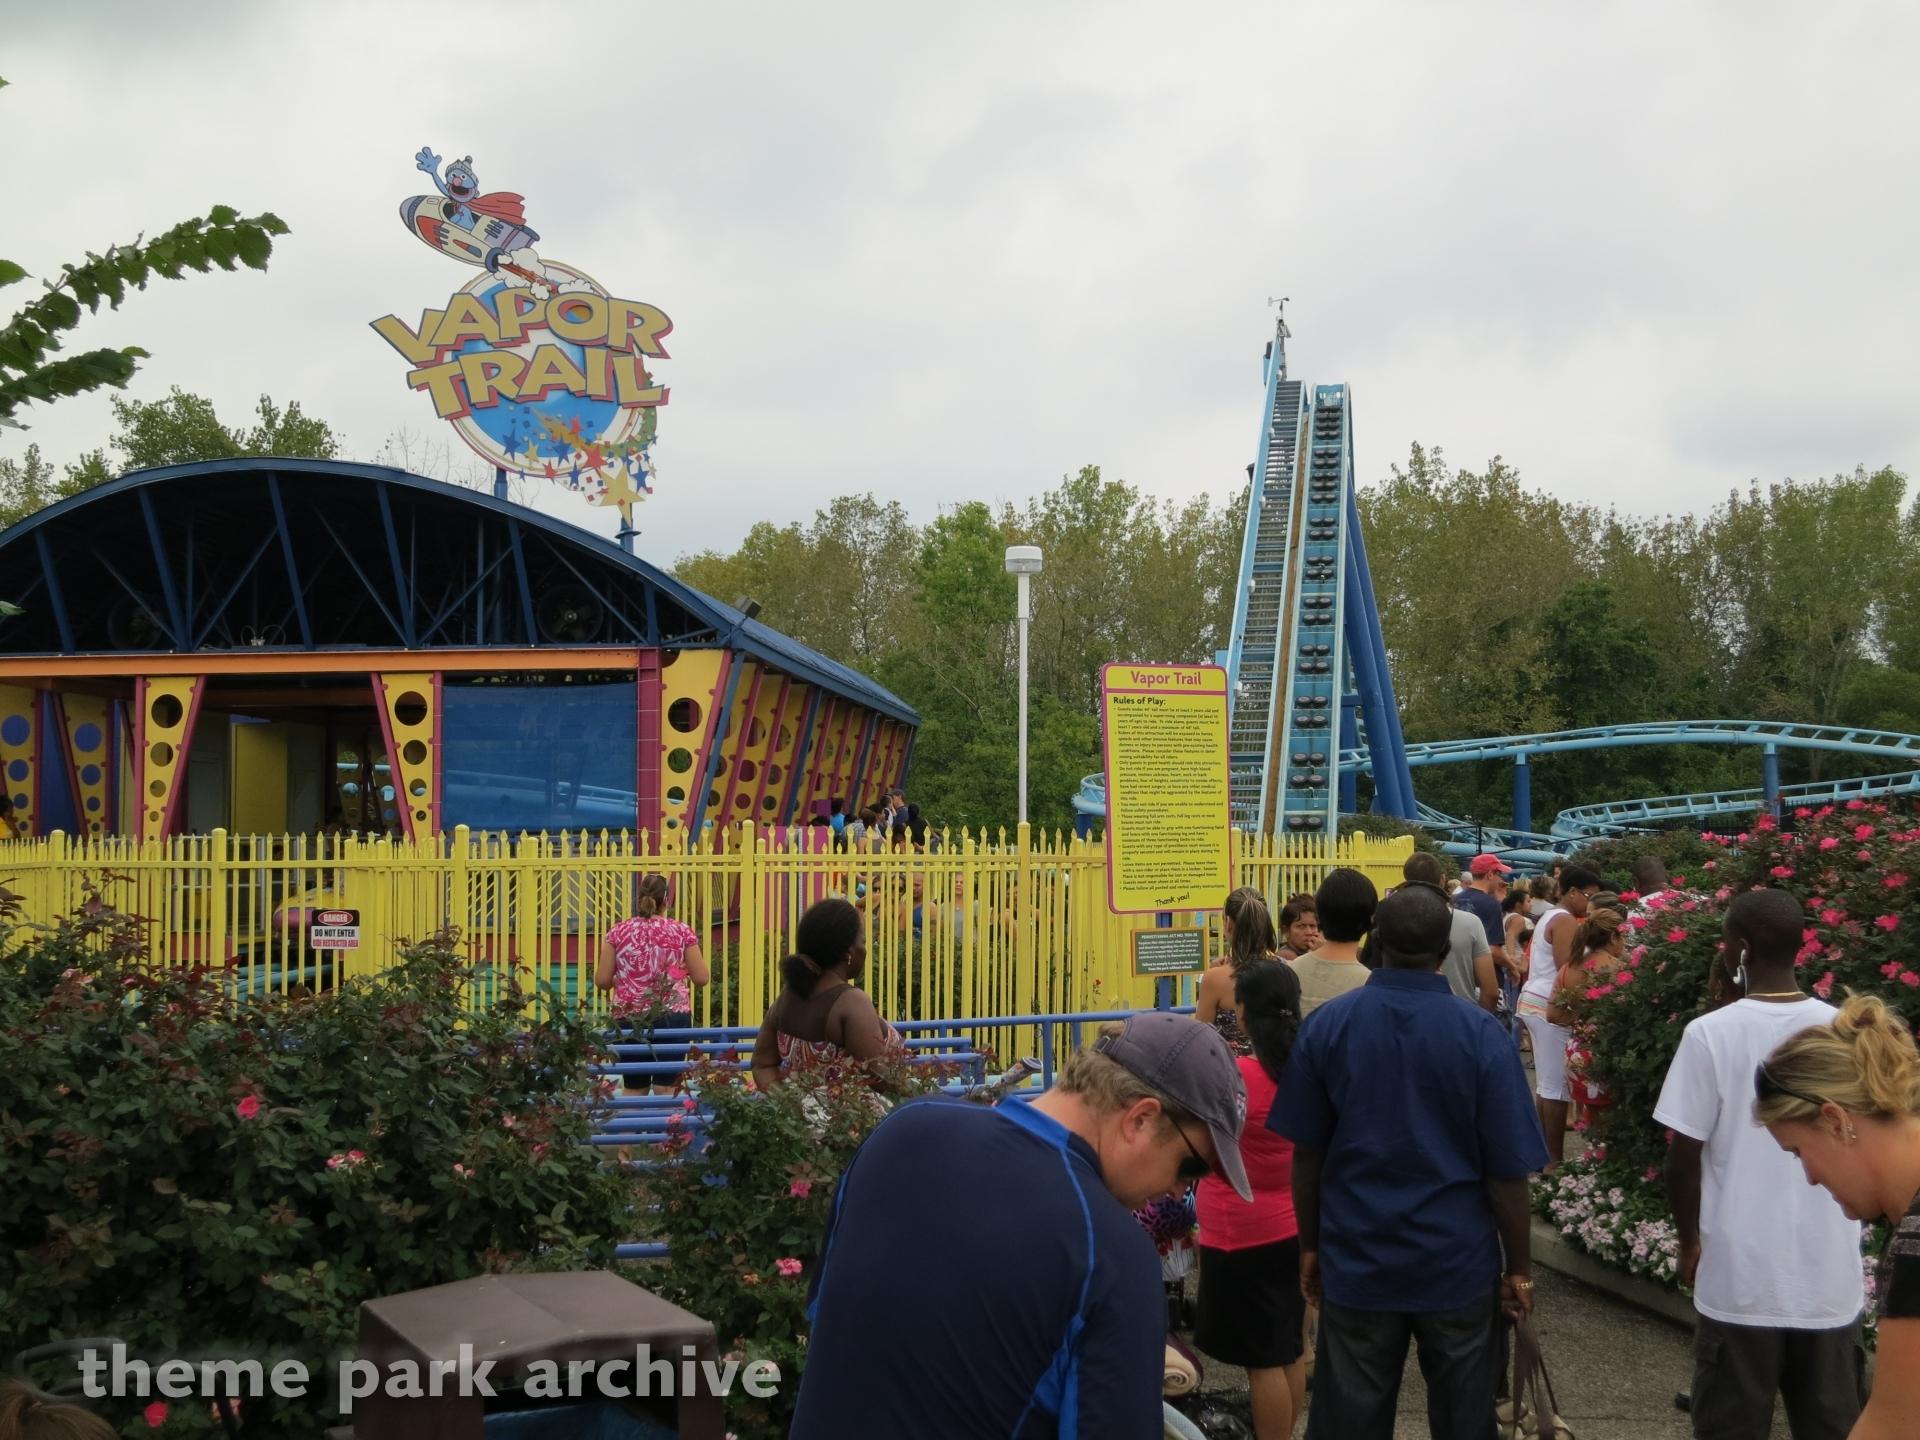 Vapor Trail at Sesame Place